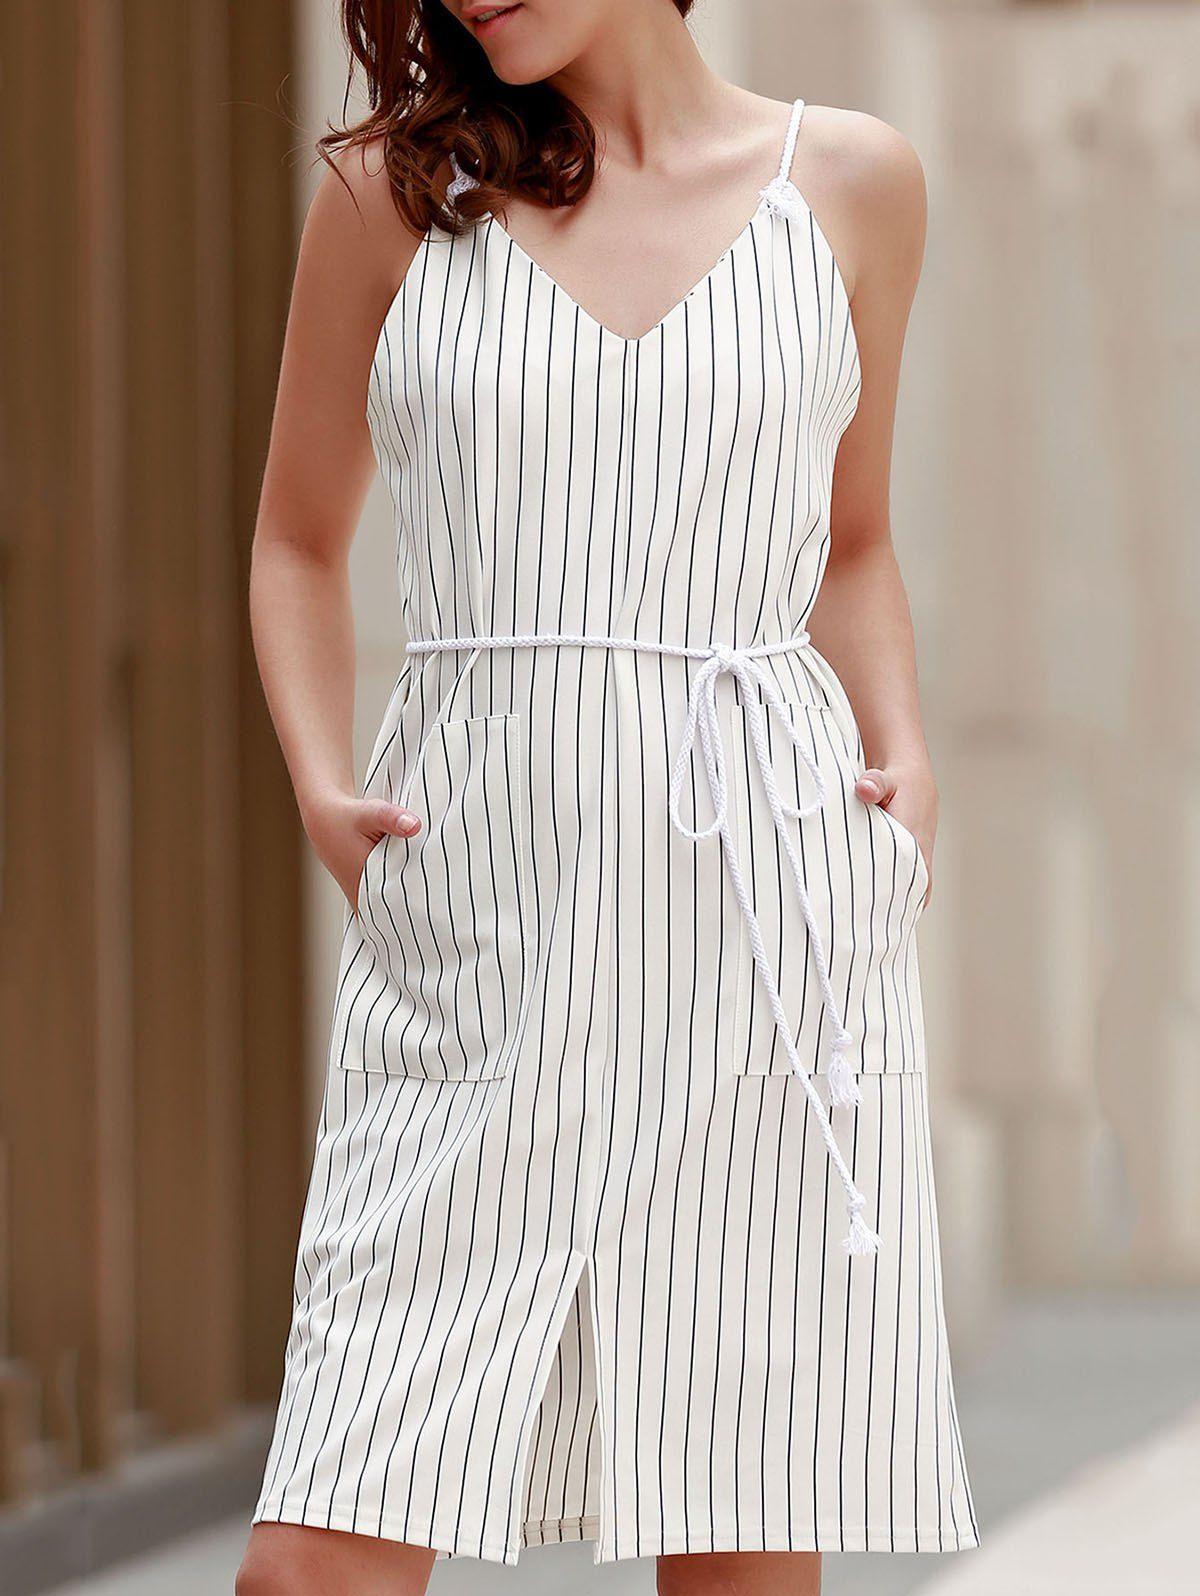 Brief Vertical Stripe Spaghetti Strap Summer Dress For Women Summer Dresses For Women Striped Dress Summer Summer Dresses [ 1596 x 1200 Pixel ]